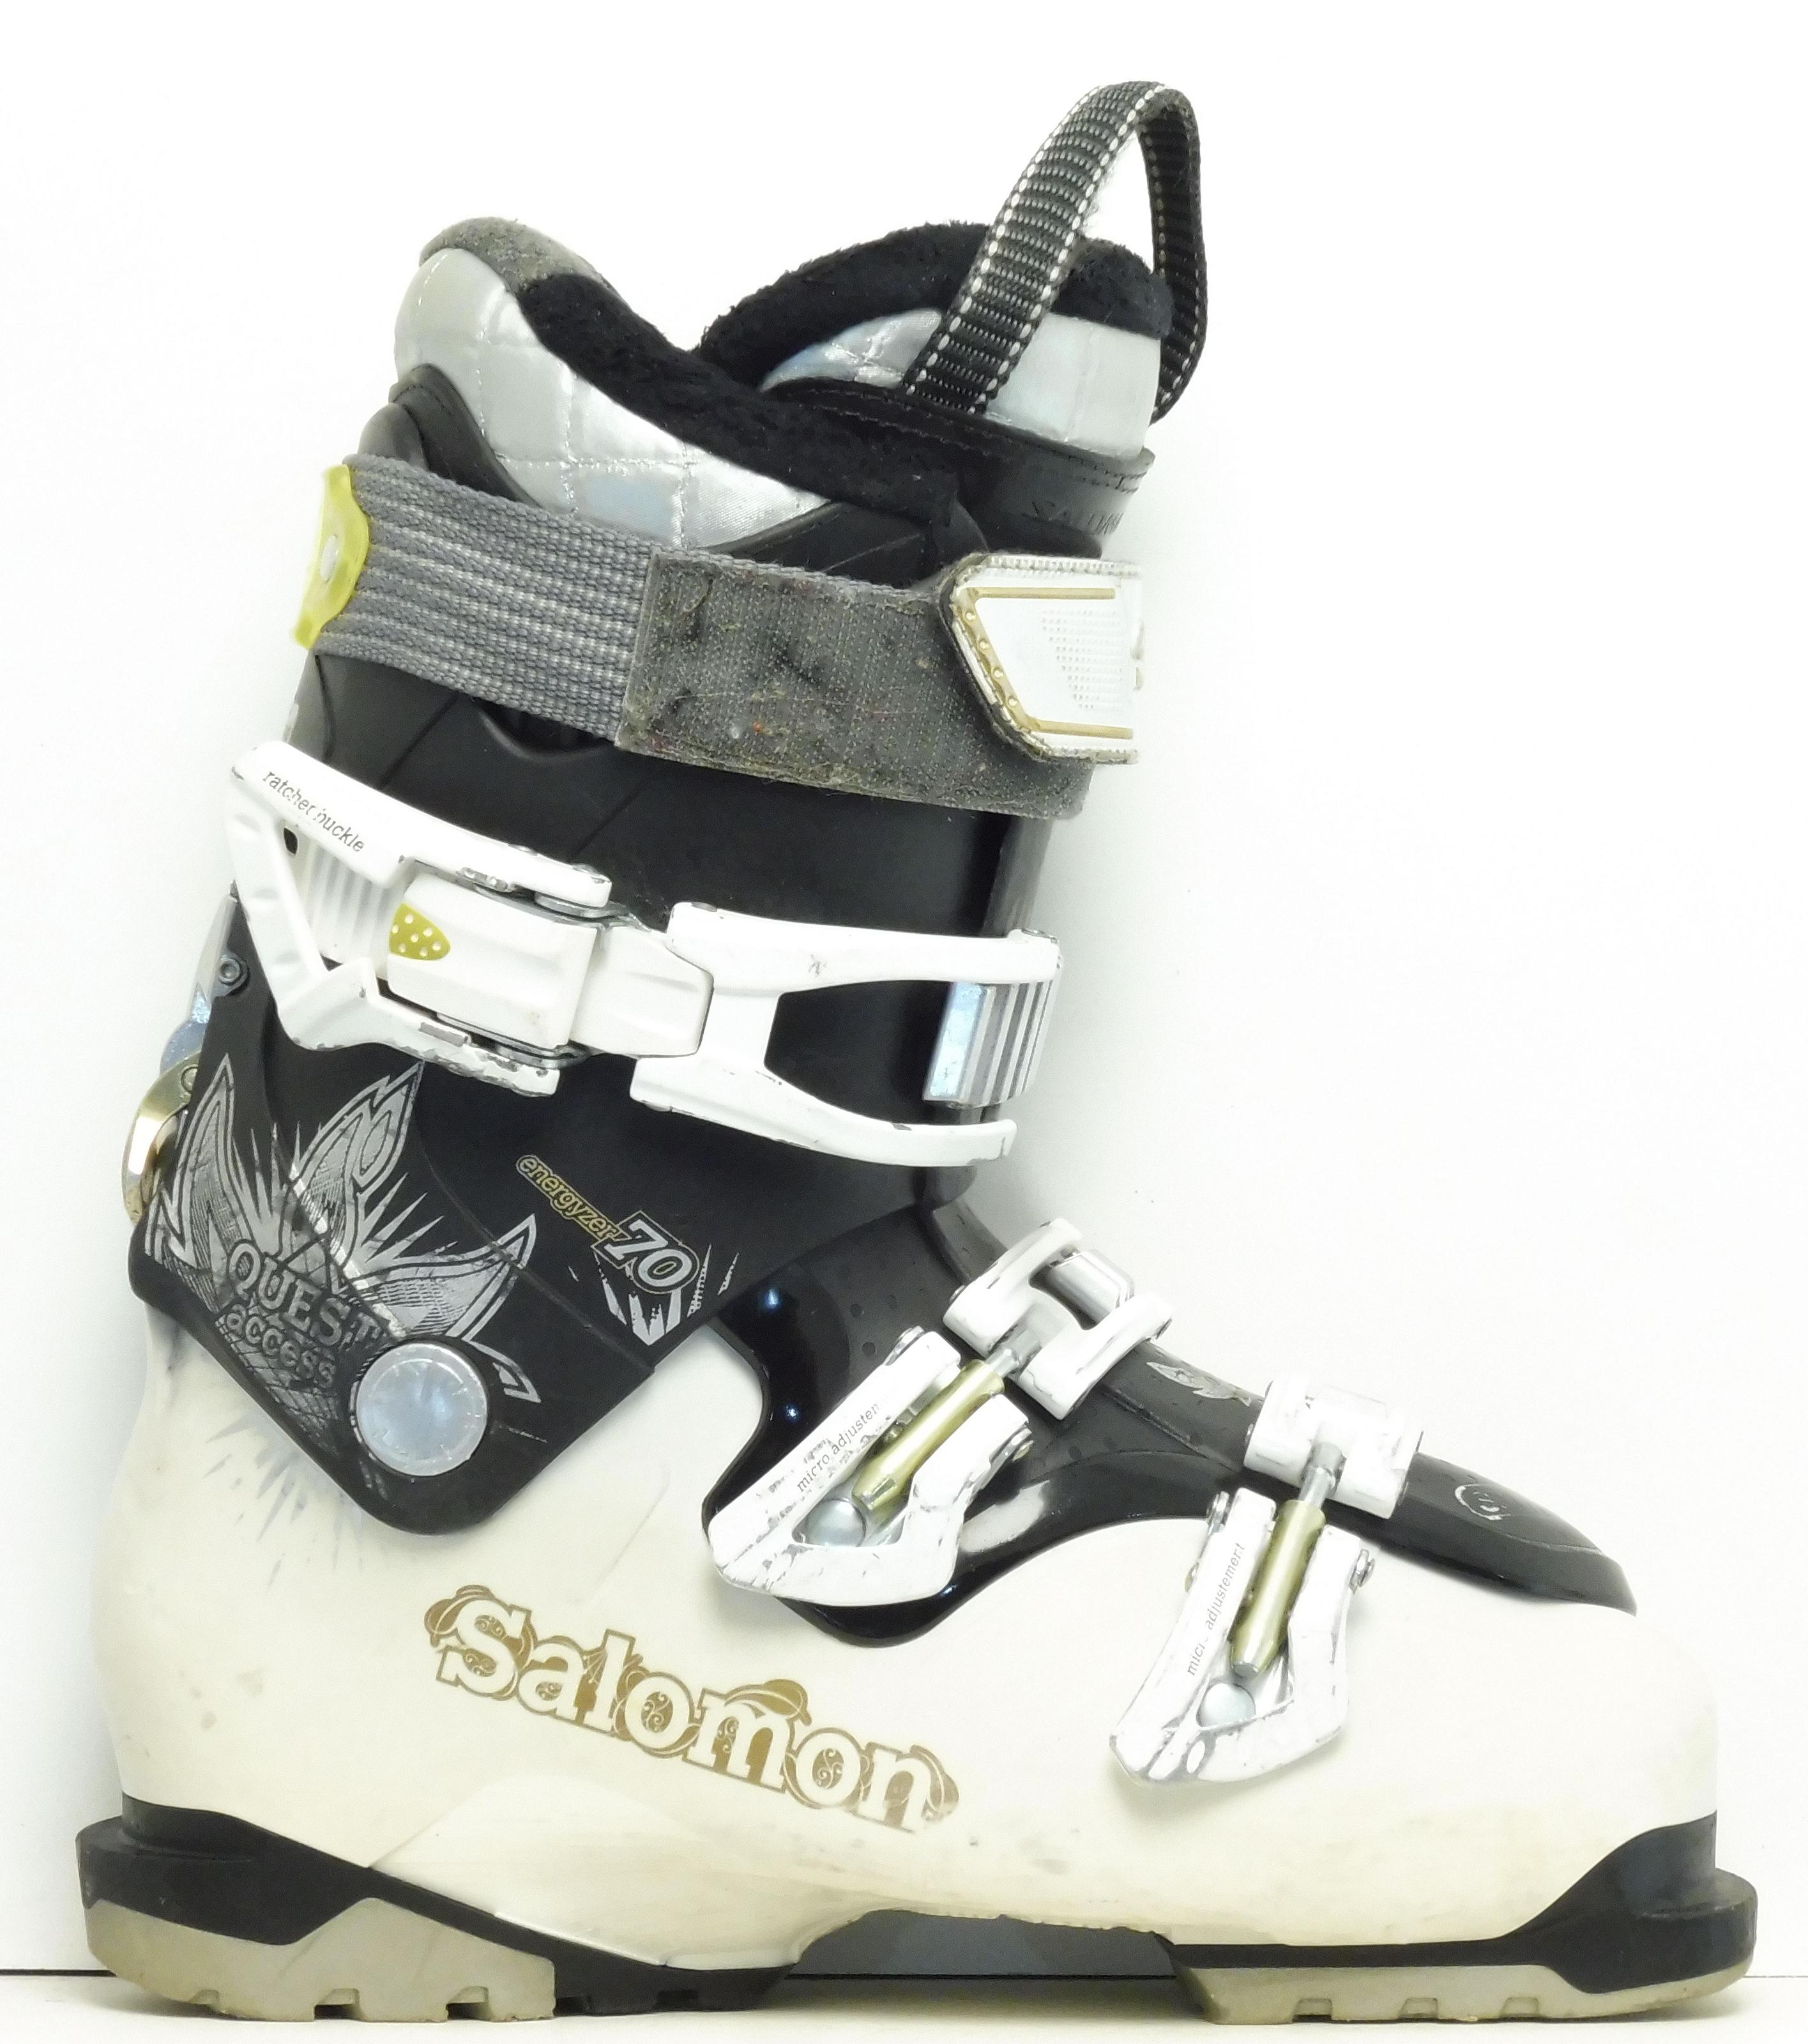 salomon Dámske lyžiarky BAZÁR Salomon Quest Access 255 dc7495afceb